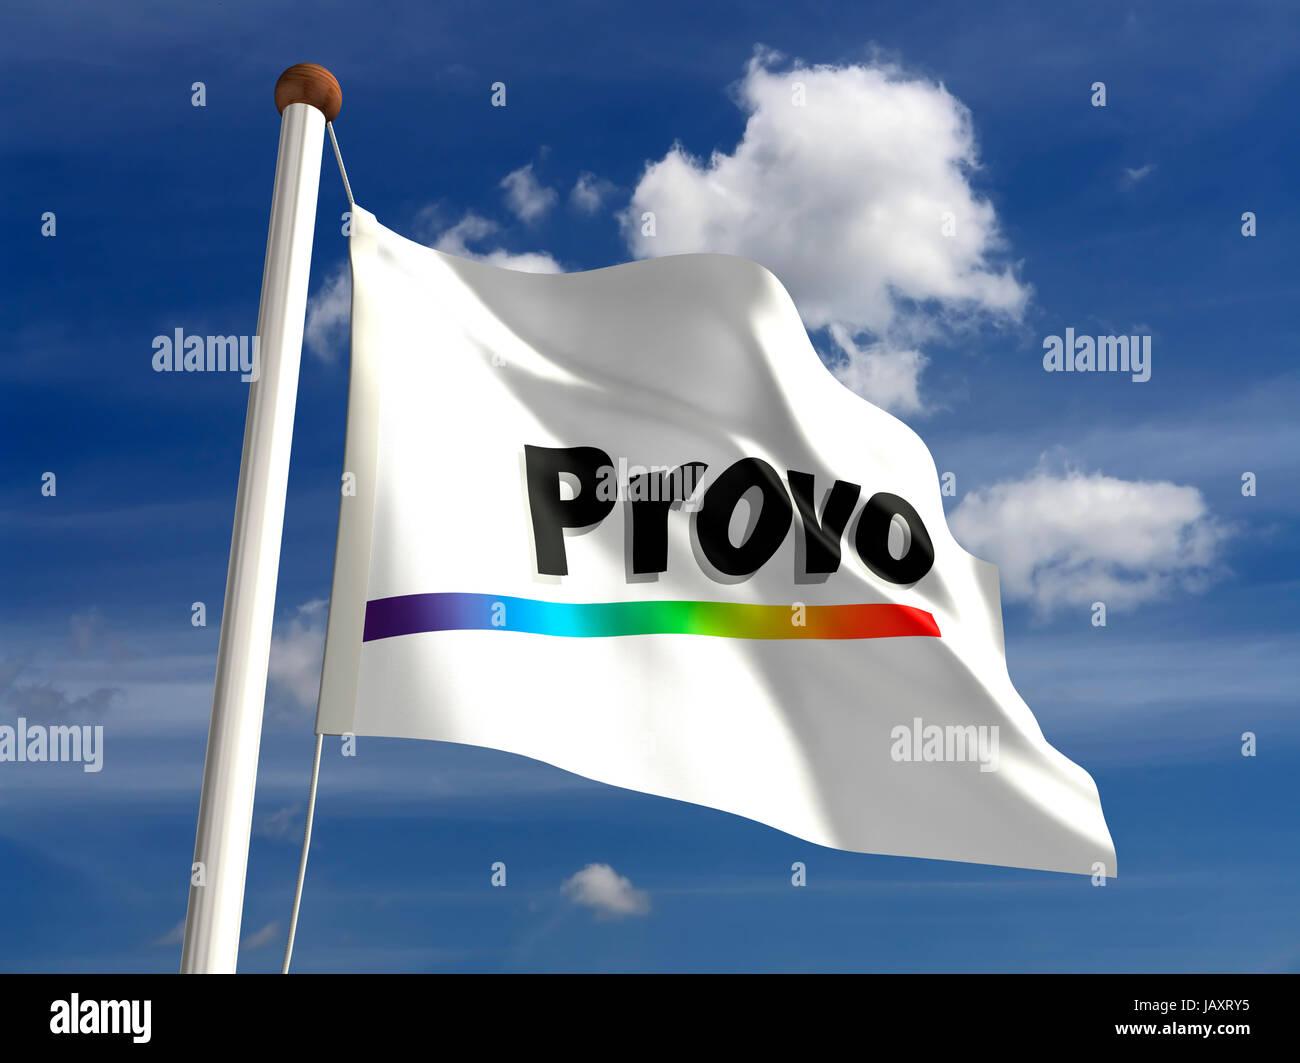 Provo-Style Flag of Reddit : vexillology